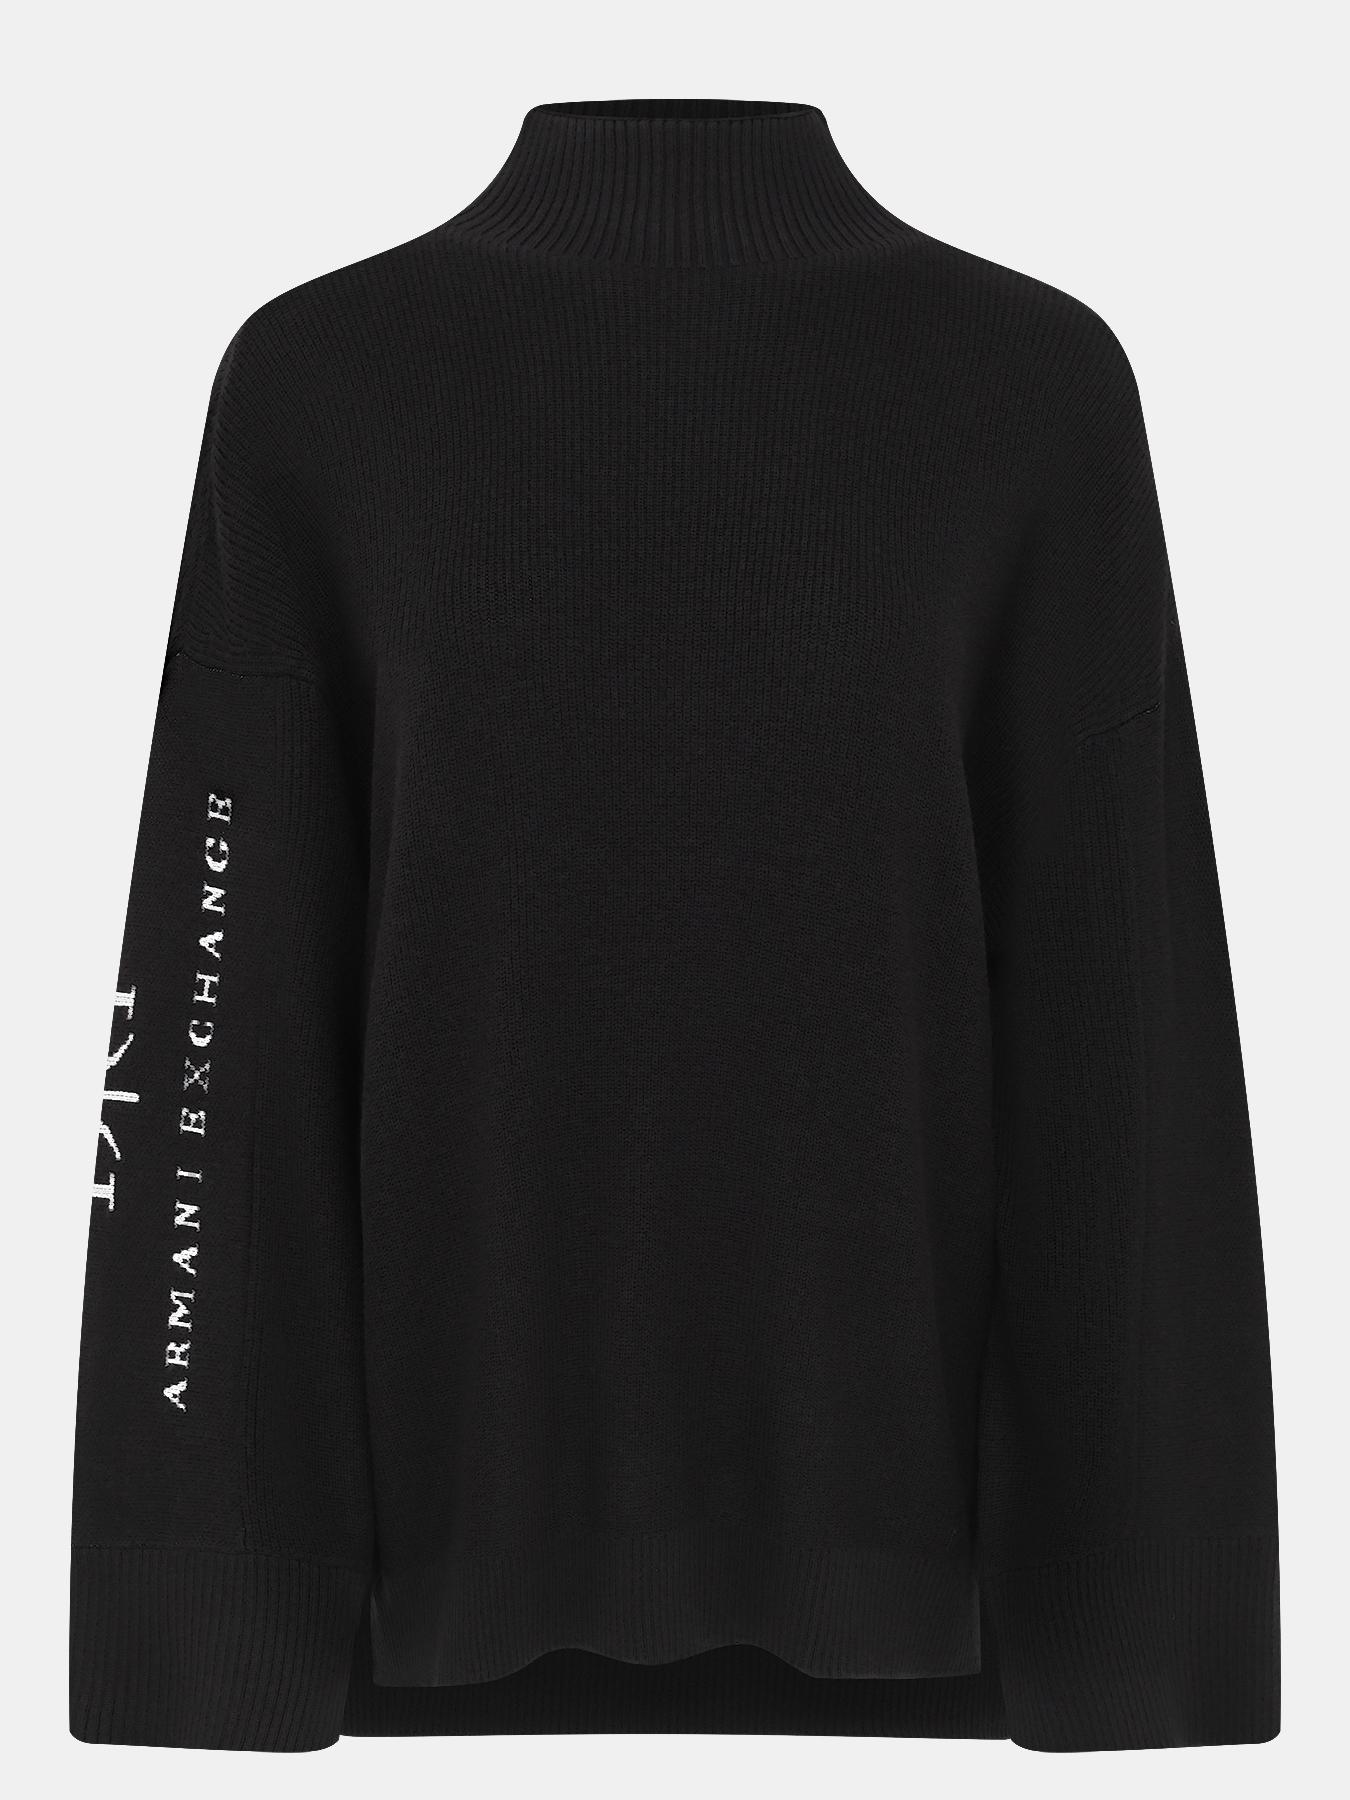 armani junior свитер Свитеры Armani Exchange Свитер